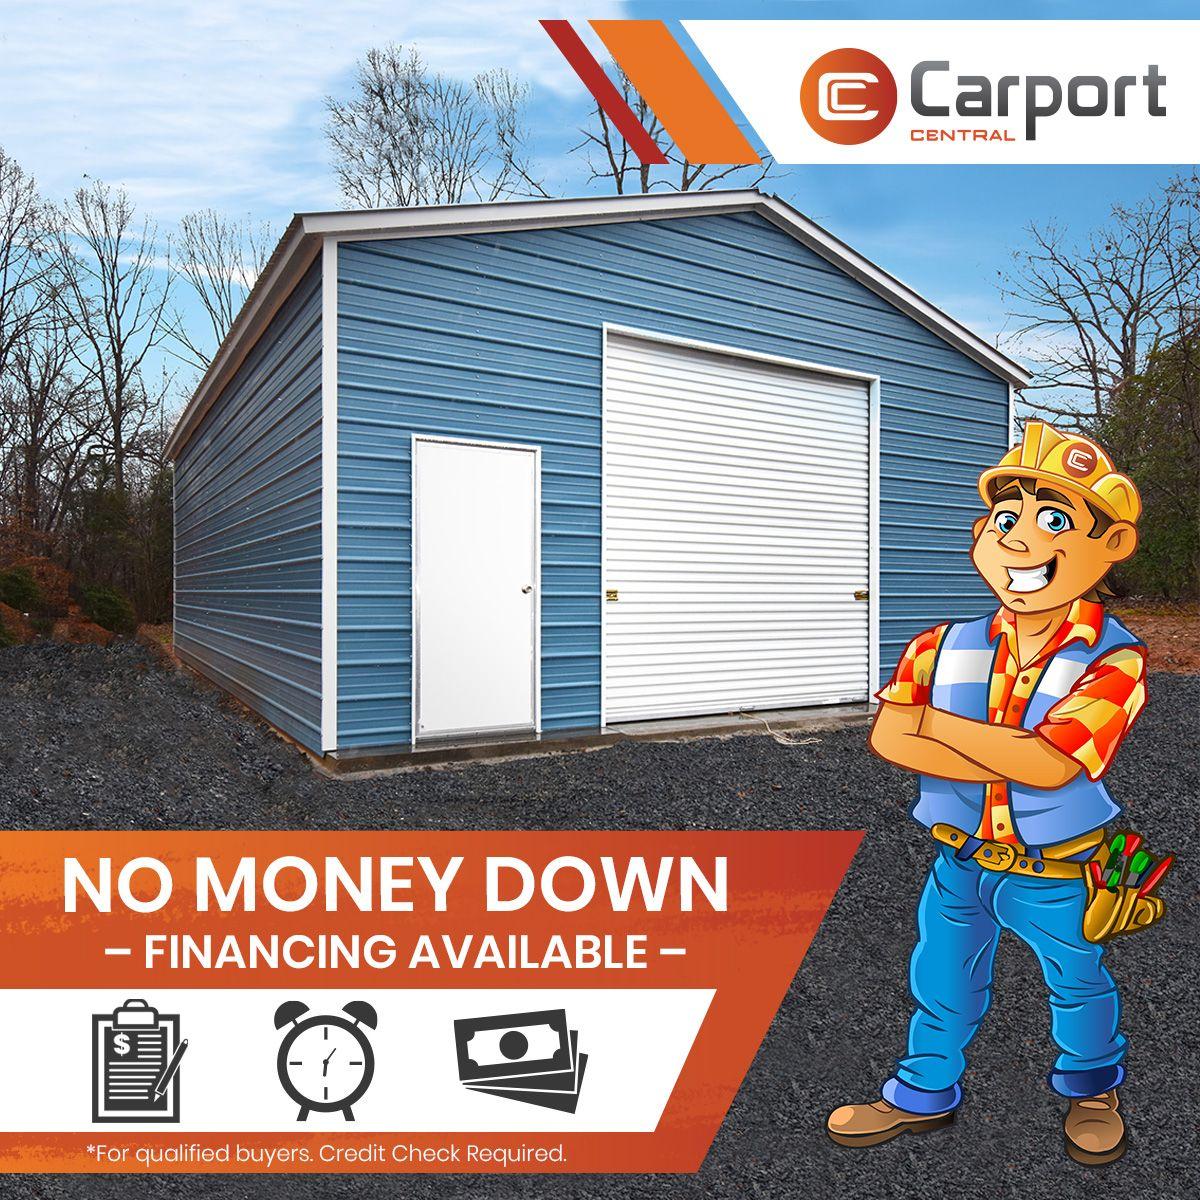 No Money Down Financing! in 2020 Rv cover, Carport